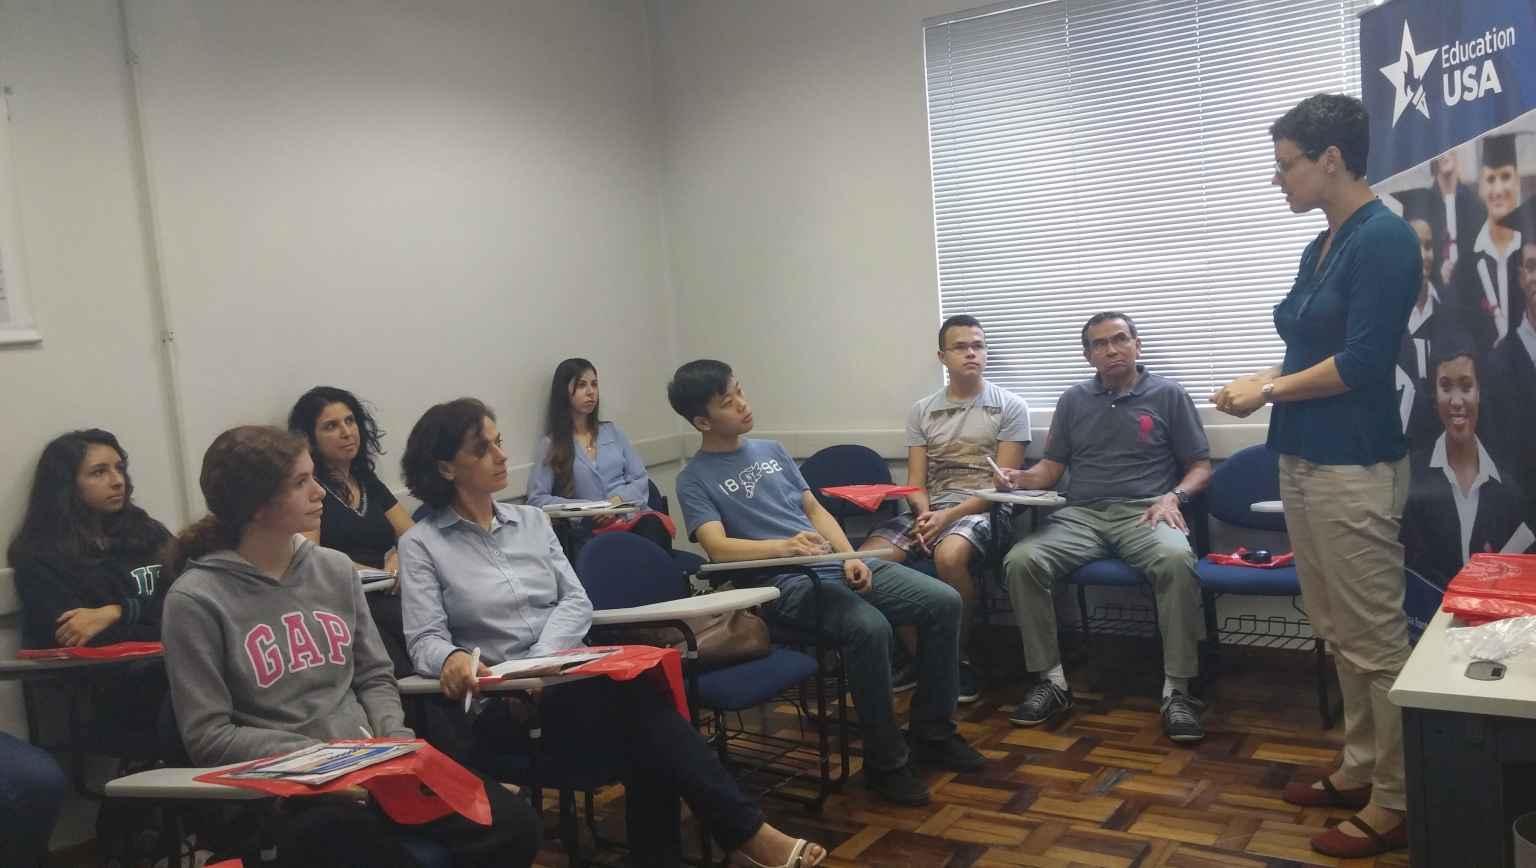 Palestra EducationUSA - International student course introduction